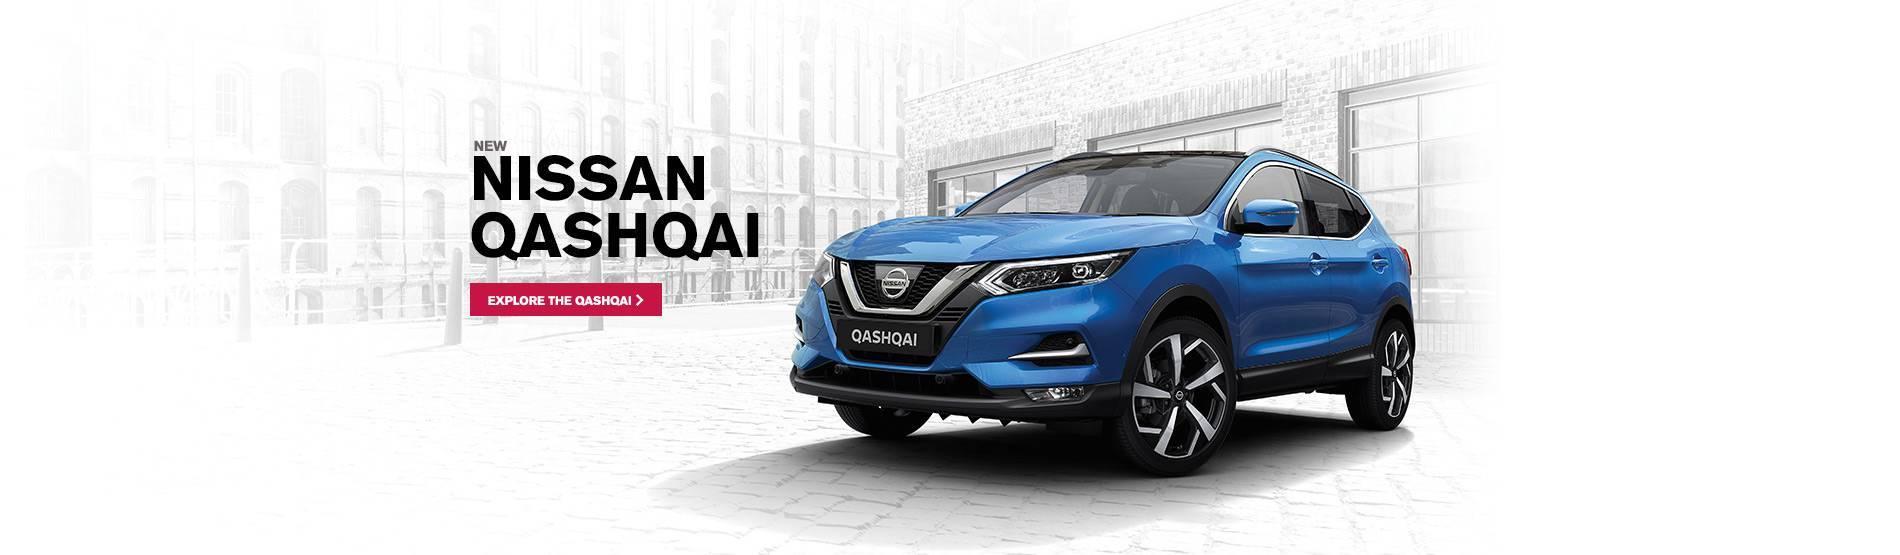 Magic Nissan - New & Used Car Sales | Nissan Dealer Melville